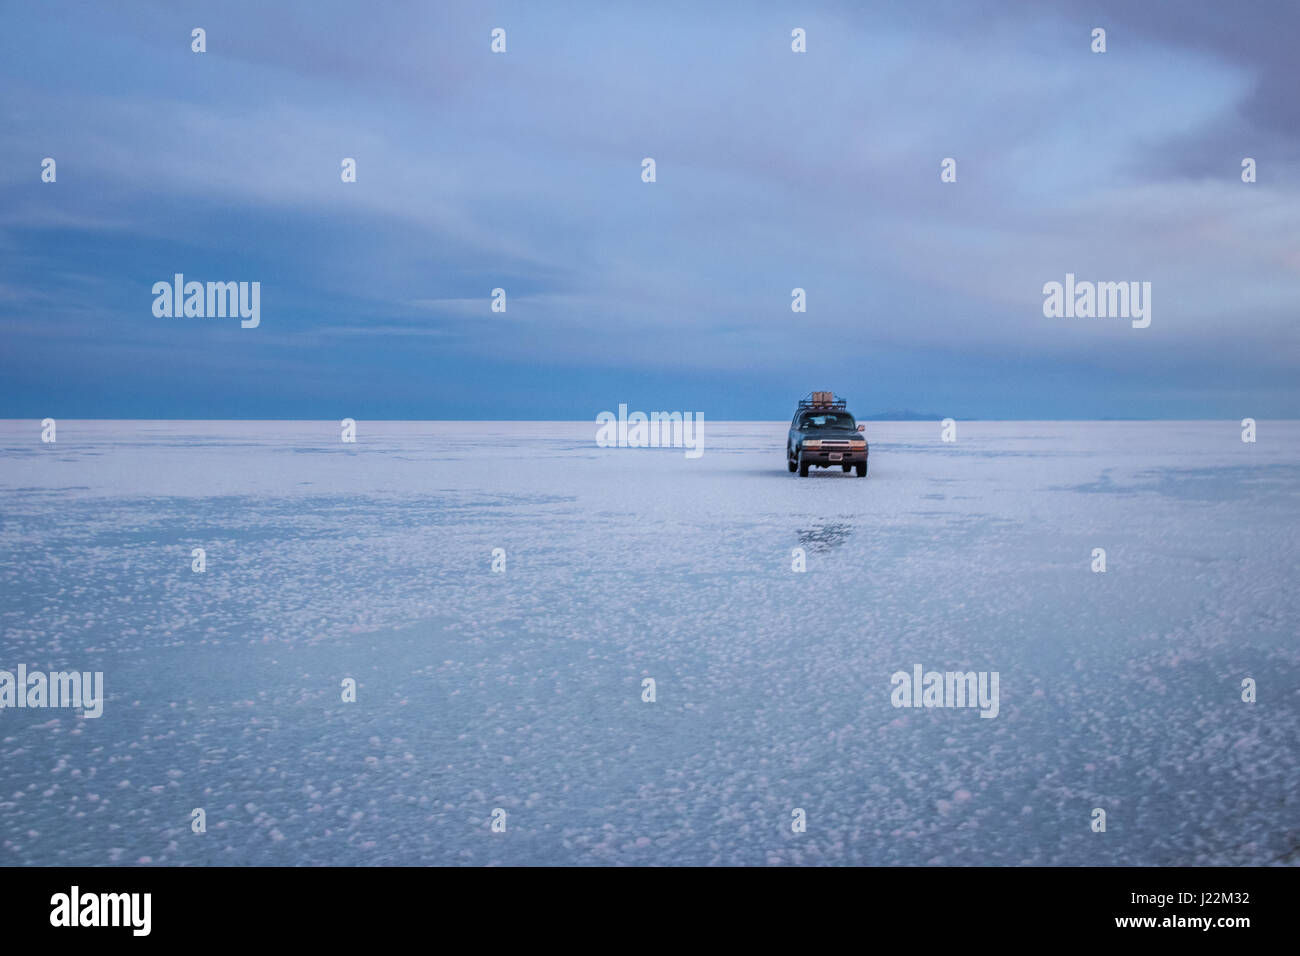 Off-road vehicle at sunrise in Salar de Uyuni salt flat - Potosi Department, Bolivia - Stock Image